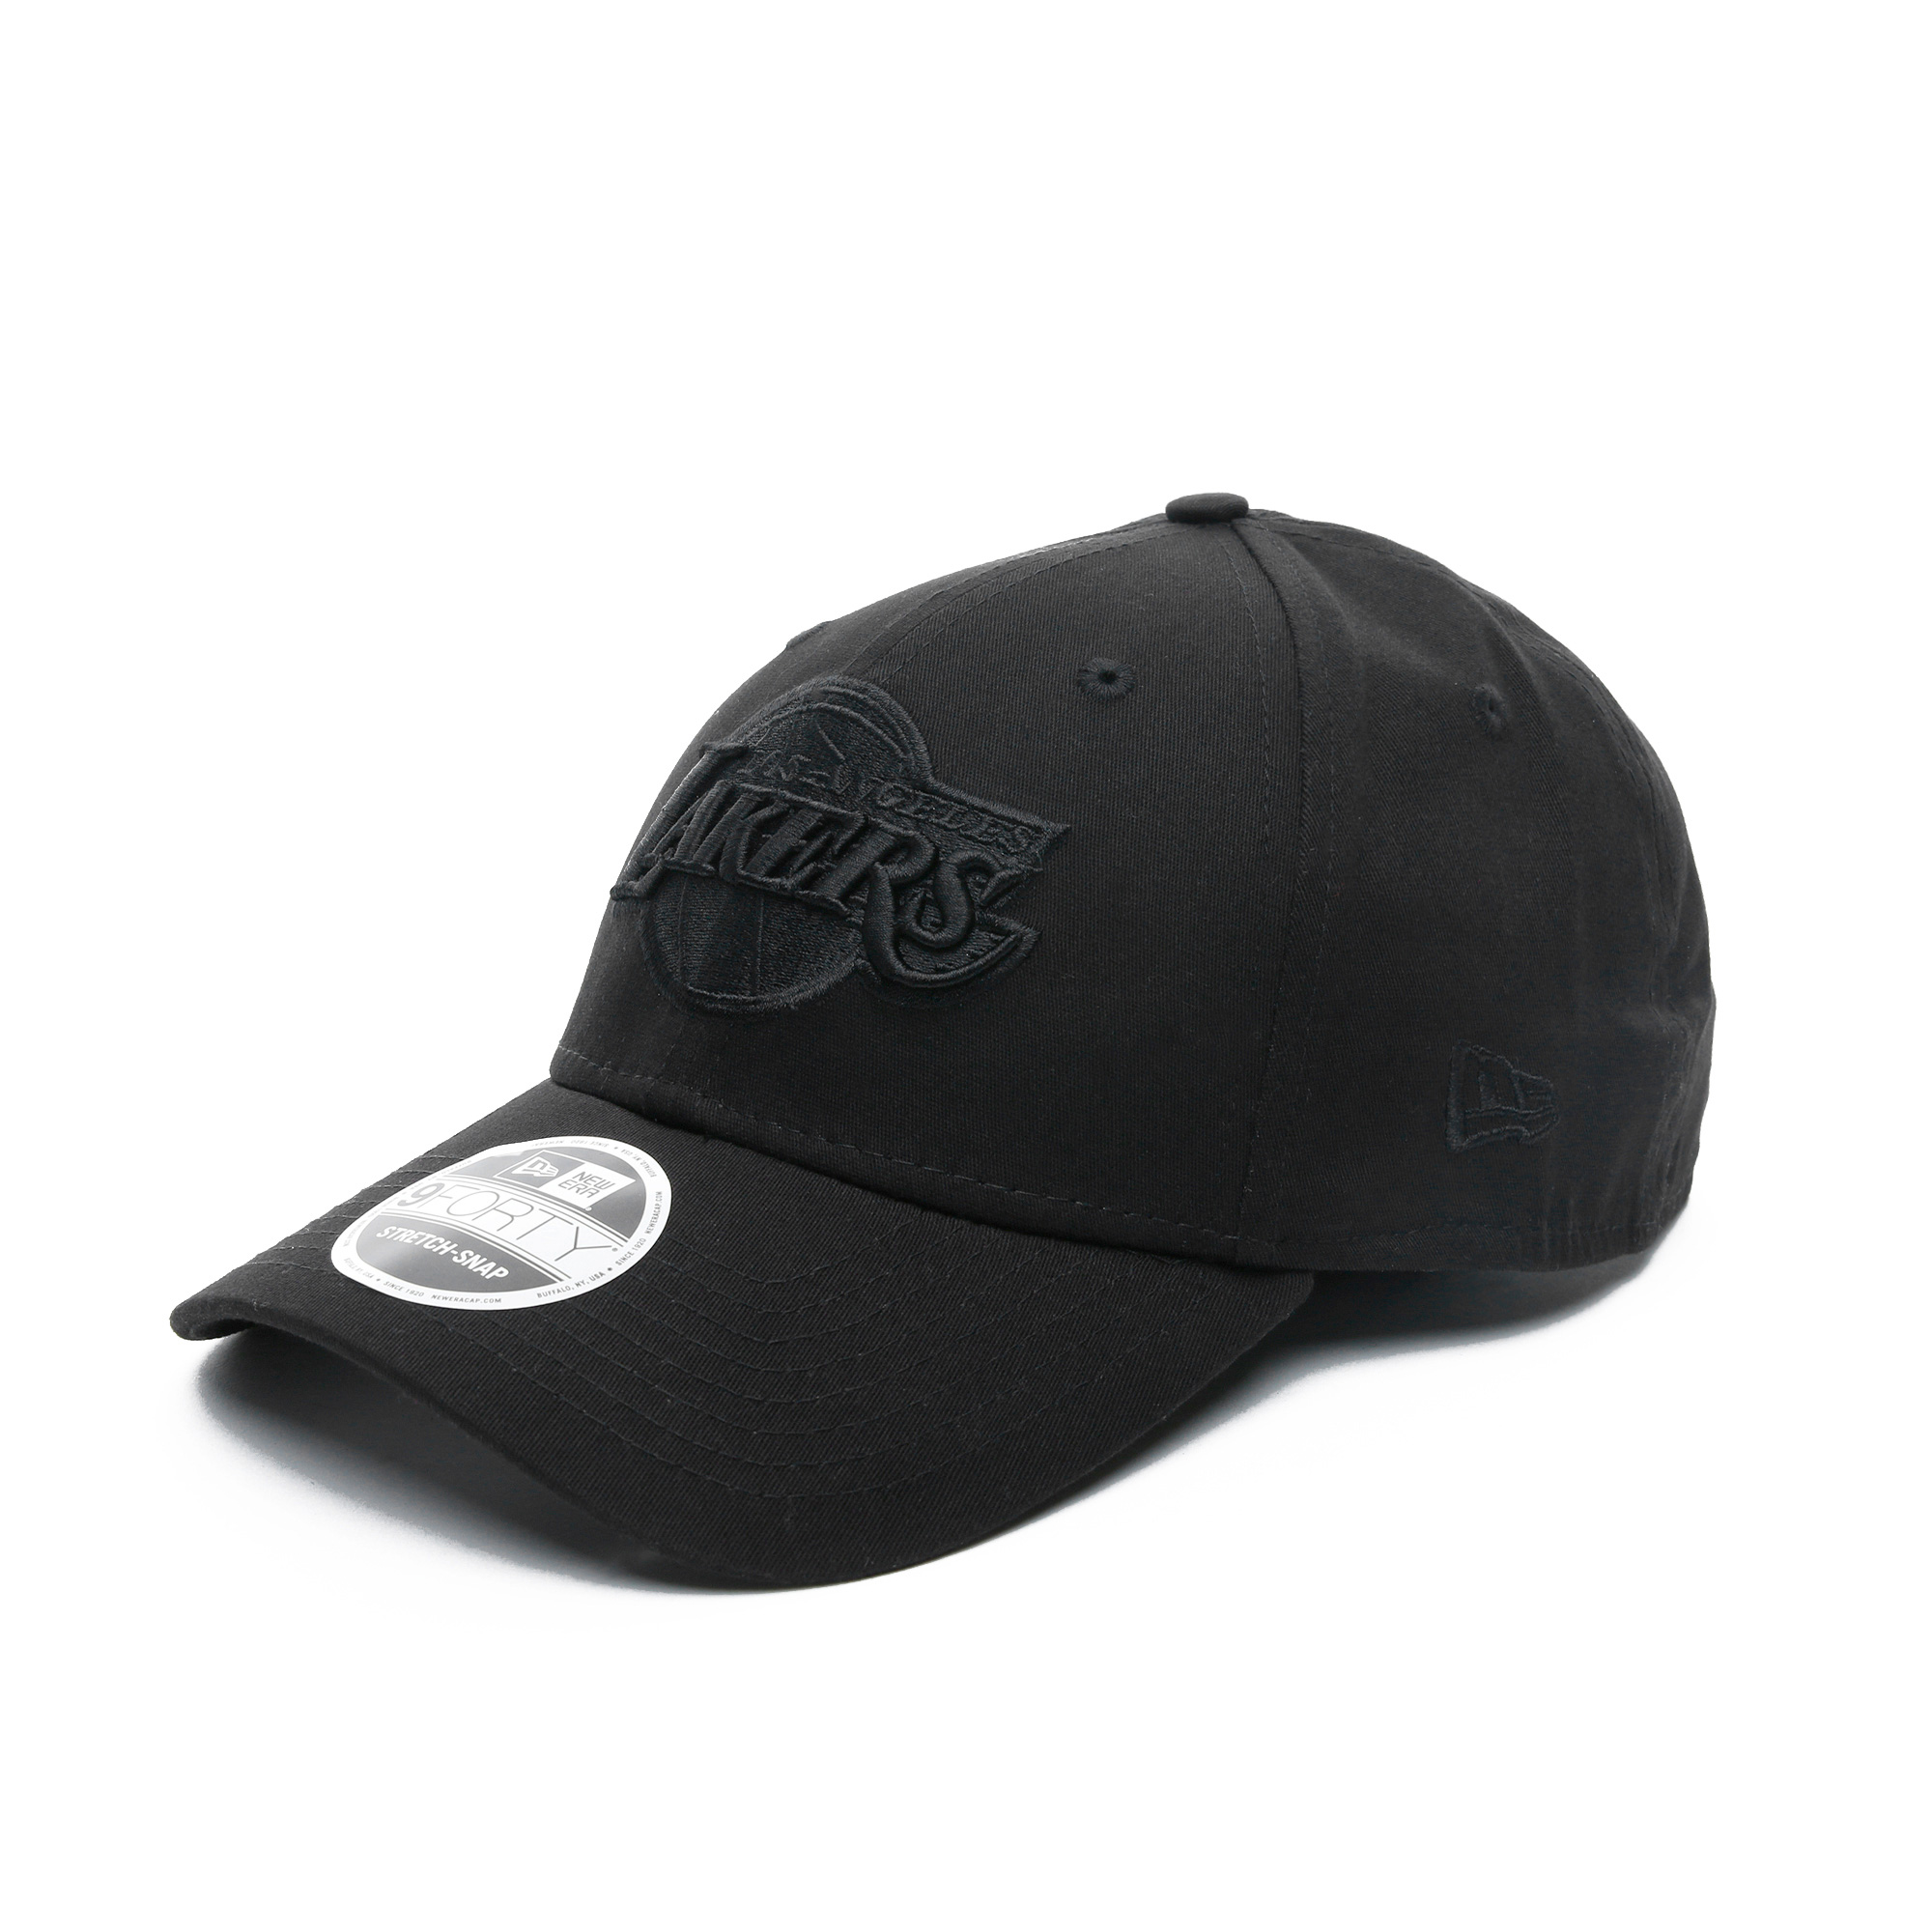 New Era Los Angeles Lakers 940 Çocuk Siyah Şapka